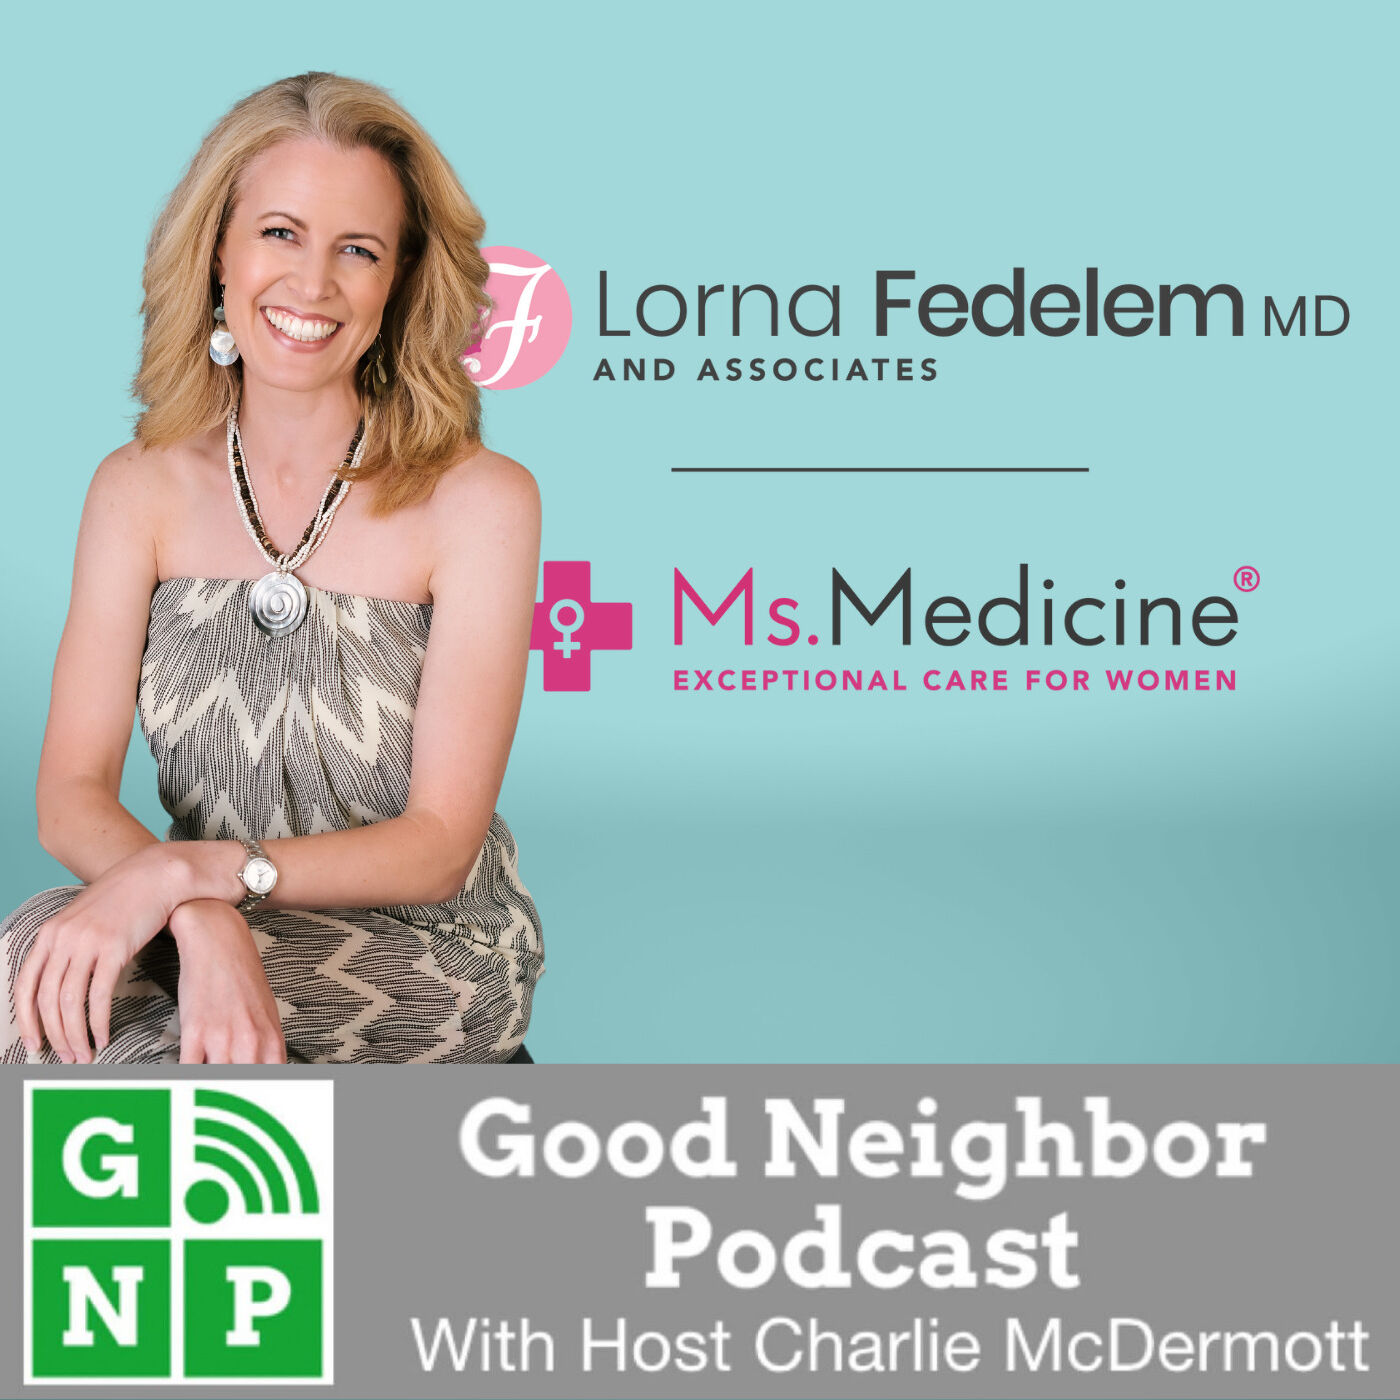 EP #558: Lorna Fedelem MD & Associates with Dr. Lorna Fedelem